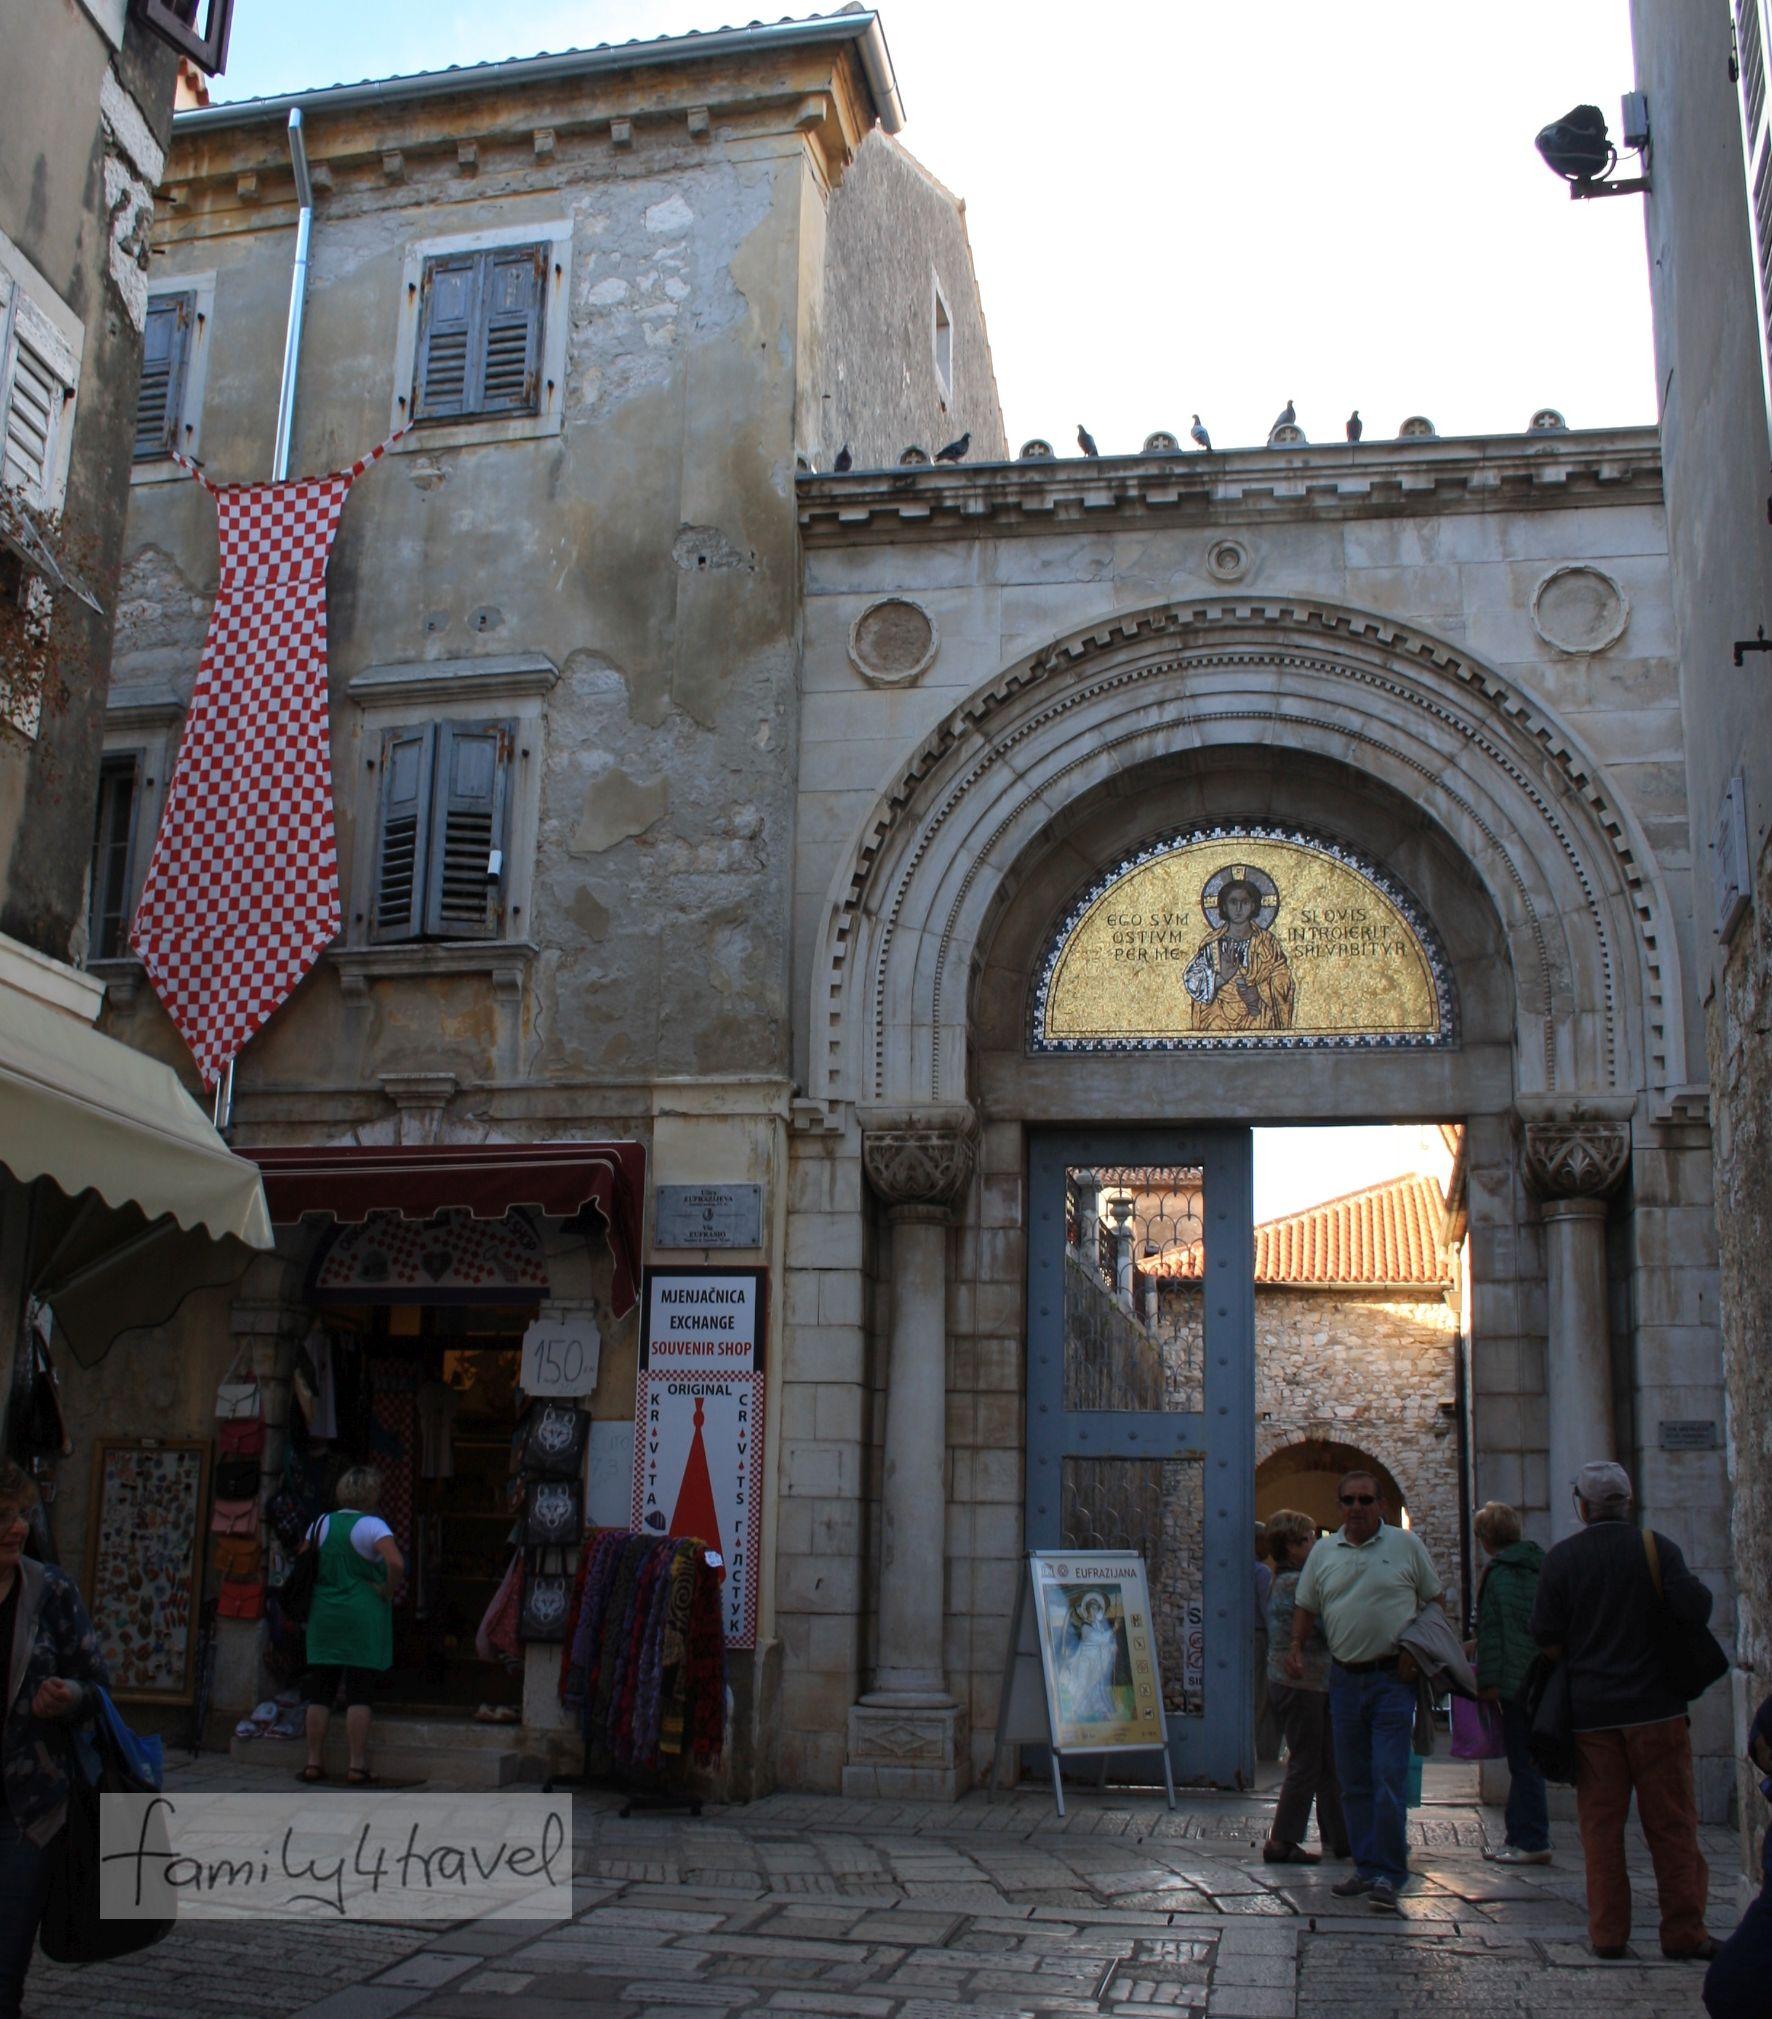 Weltkulturerbe neben Nippesläden: Hier geht's zur berühmten Basilika.